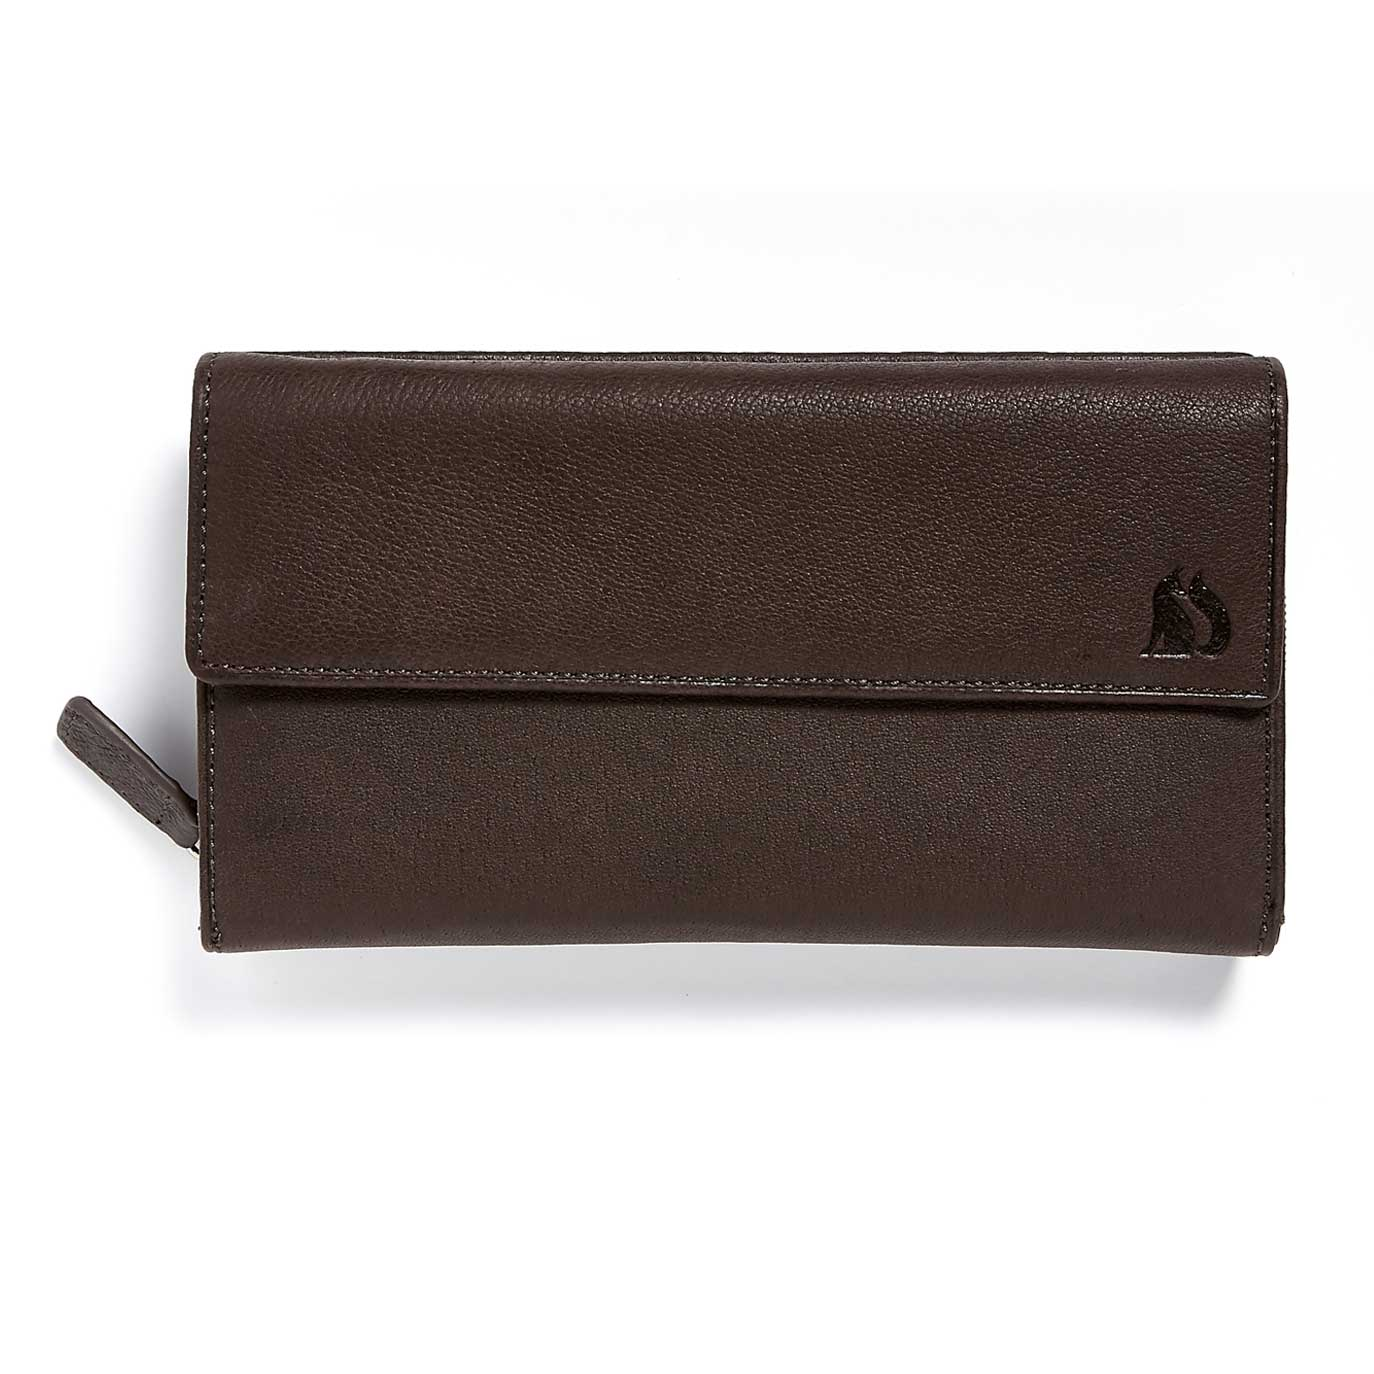 grizedale-foxfield-brown-leather-purse